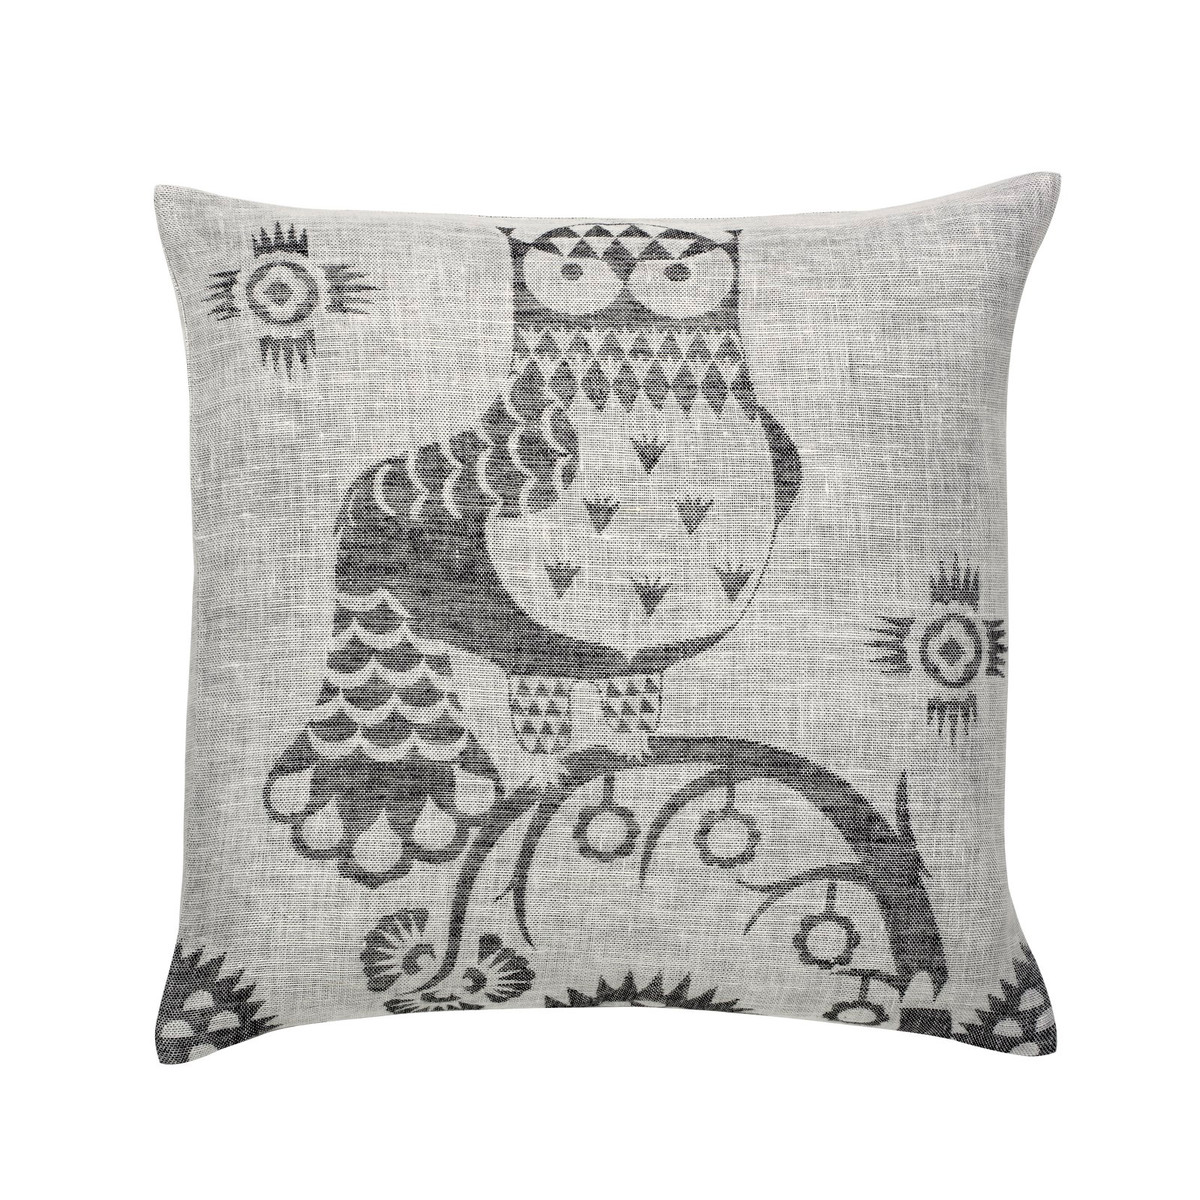 iittala taika kissenbezug 50 x 50 cm grau grau t 50 b 50 online kaufen bei woonio. Black Bedroom Furniture Sets. Home Design Ideas